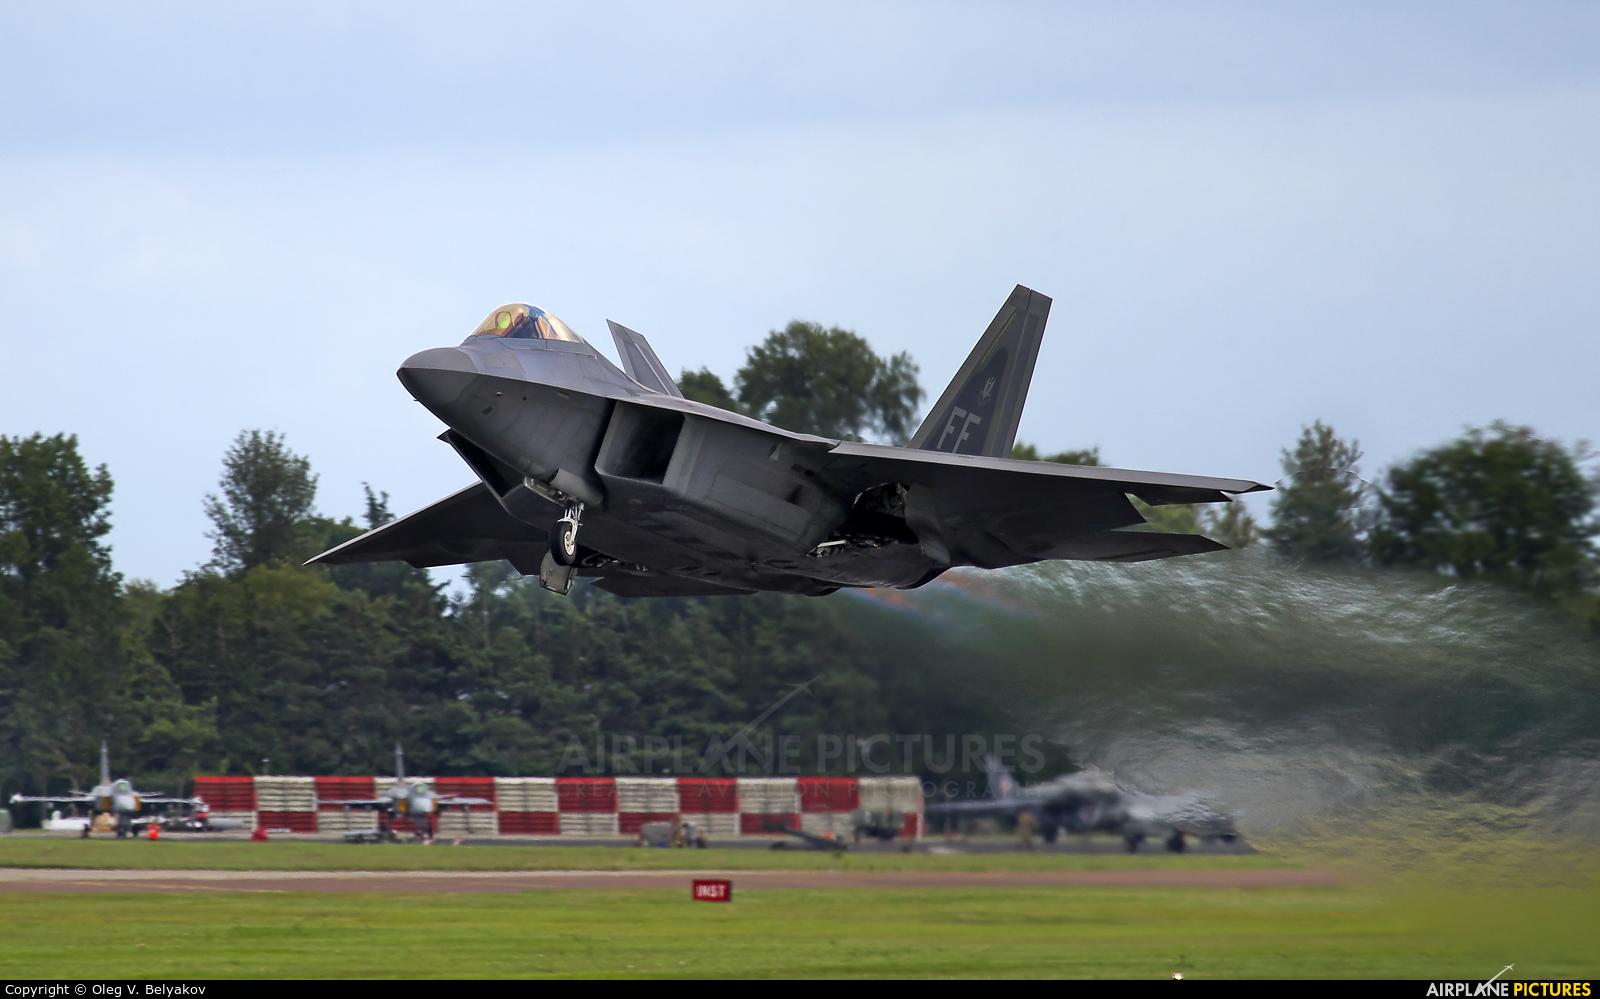 USA - Air Force 09-4191 aircraft at Fairford